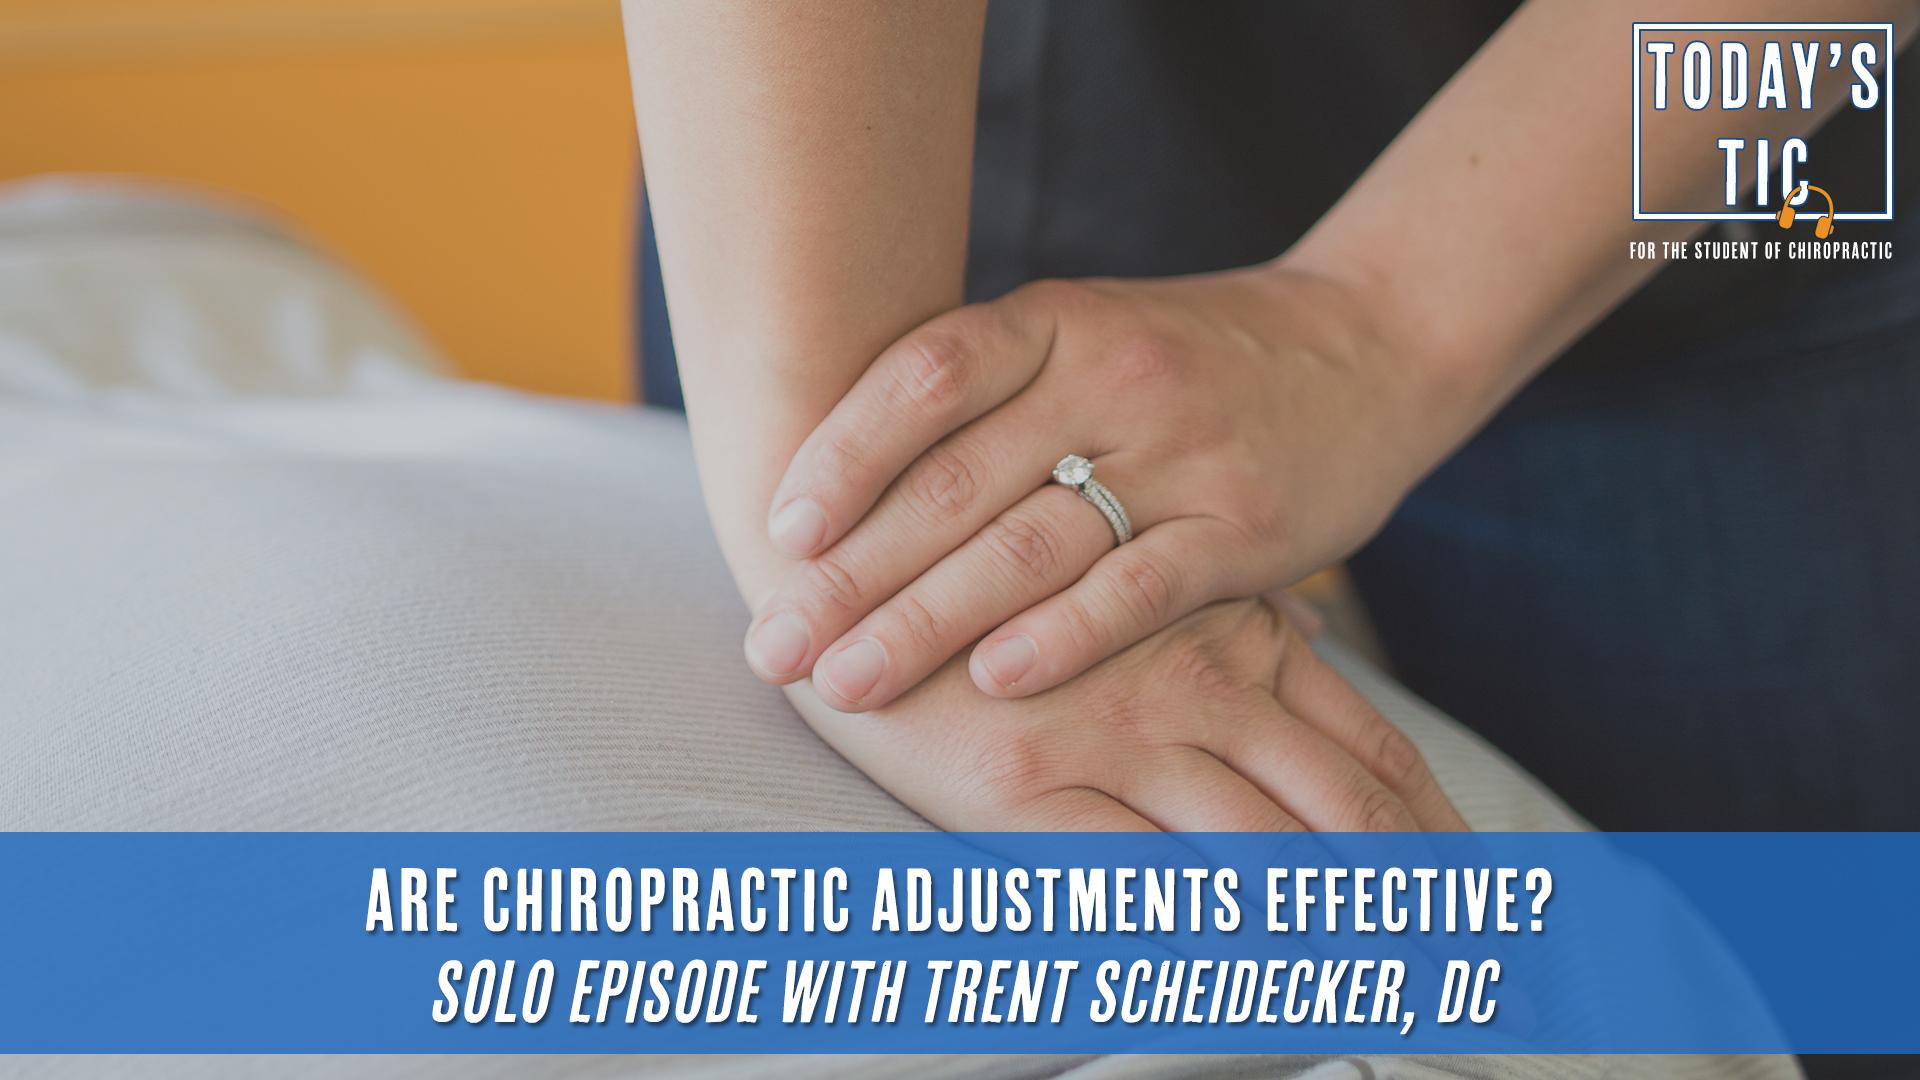 Are Chiropractic Adjustments Effective? Solo Episode with Trent Scheidecker, DC